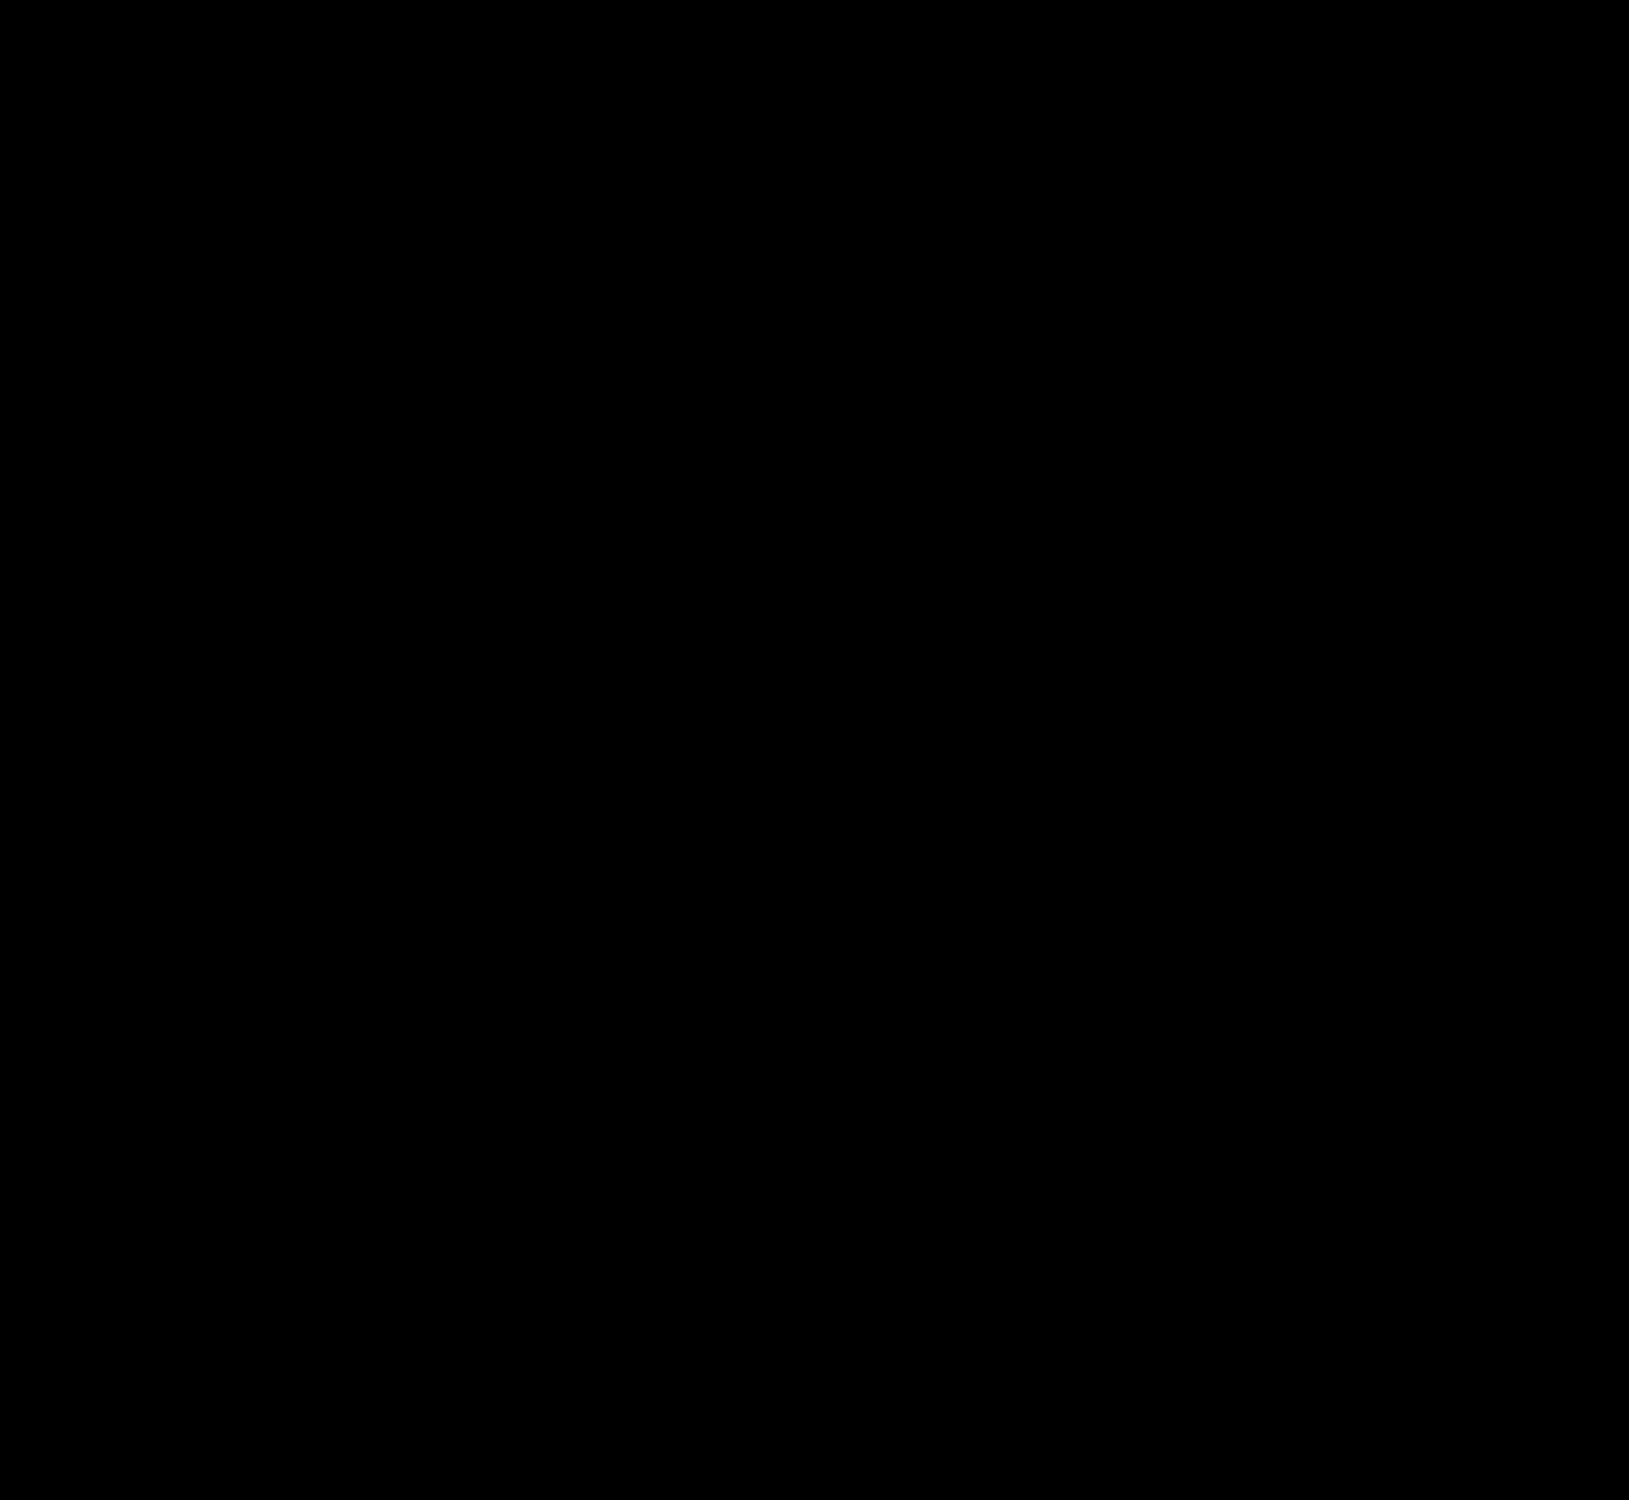 Black logo – no background